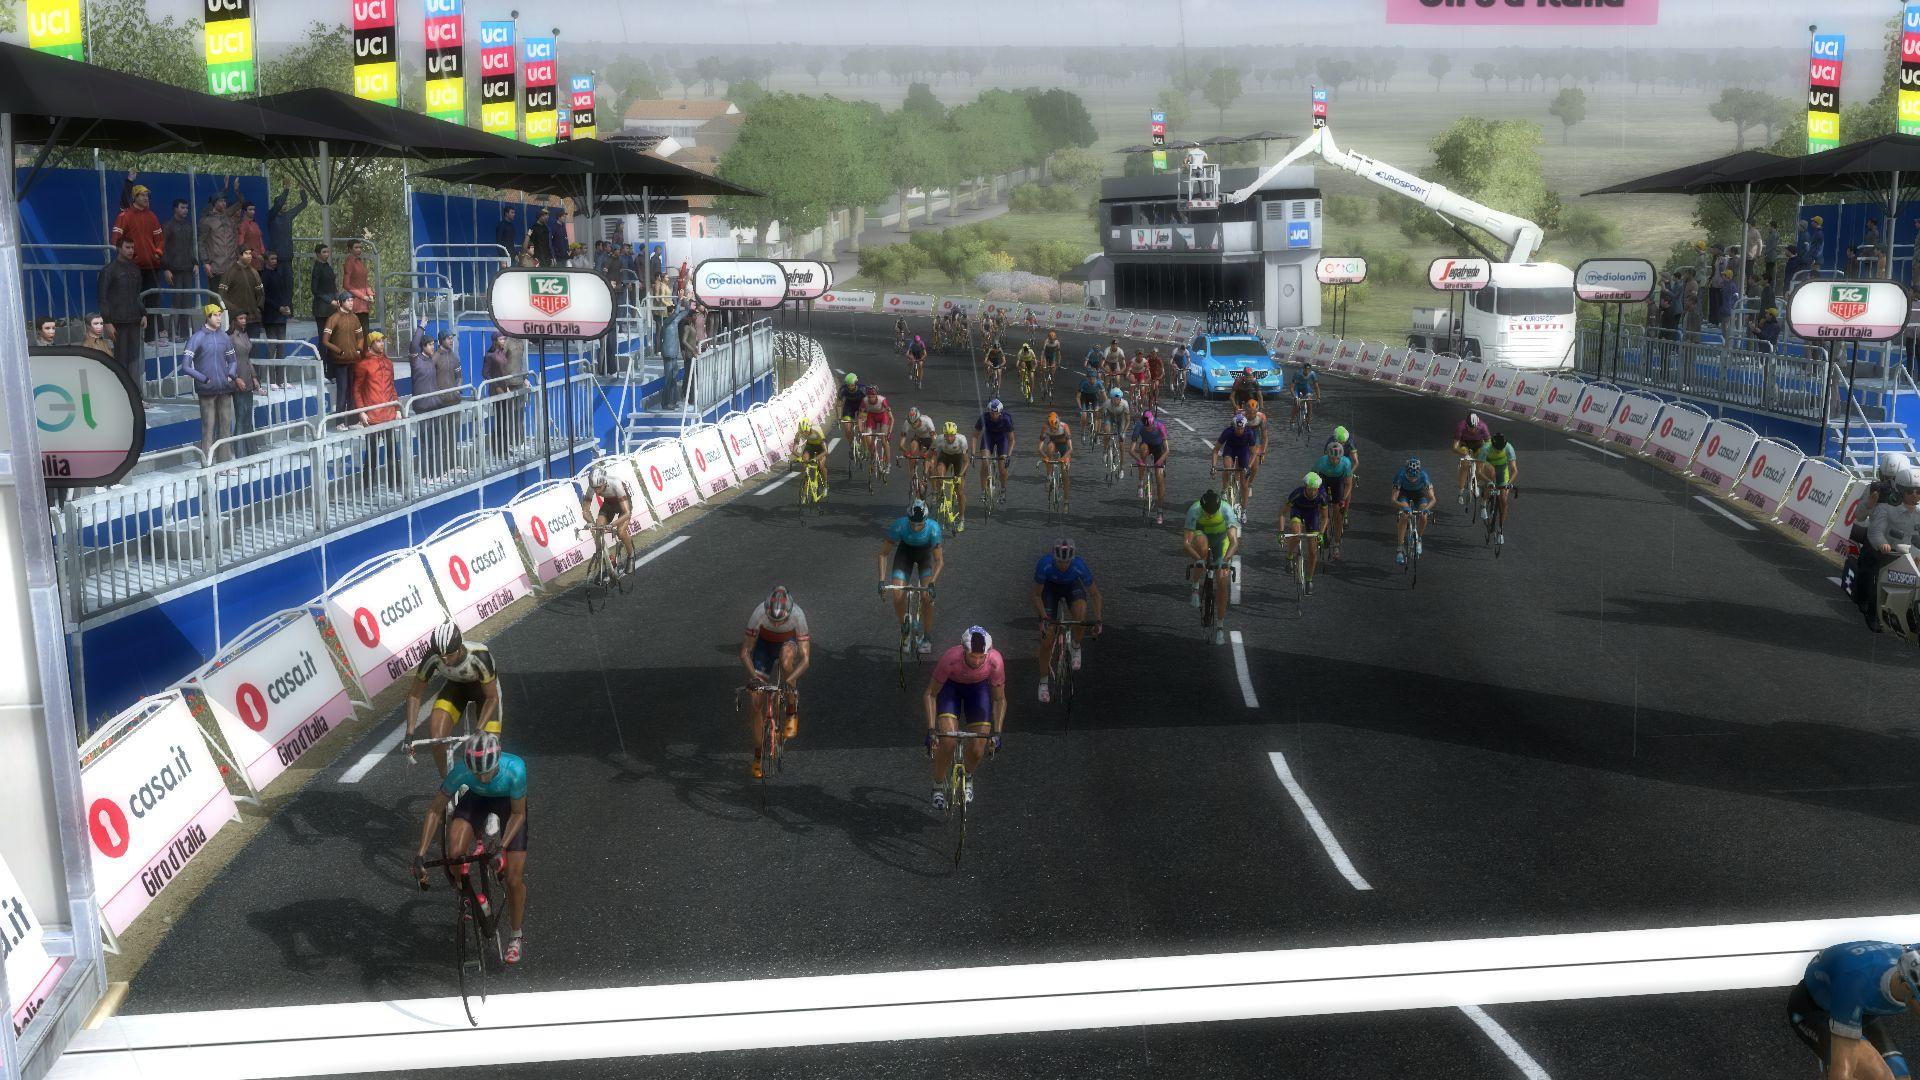 pcmdaily.com/images/mg/2020/Reports/GTM/Giro/S12/mg20_giro_s12_71.jpg